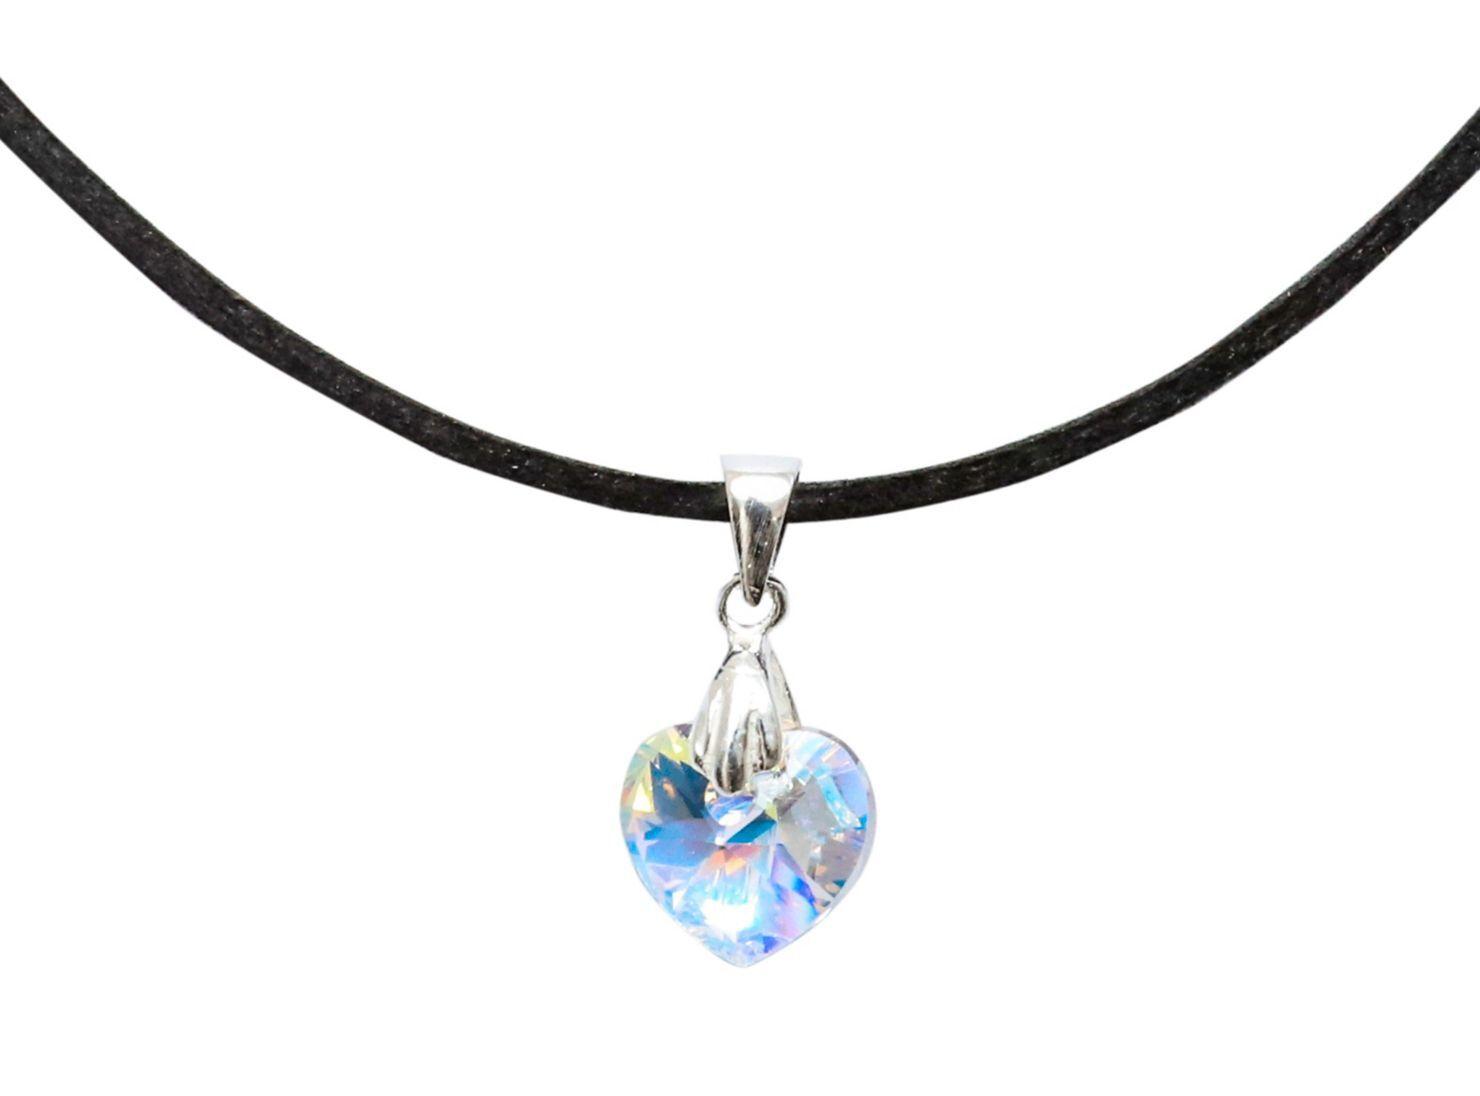 cda2dc79264a Images. Collar Colgante Moskatel Cristal Swarovski Gamuza Aurora Boreal ...